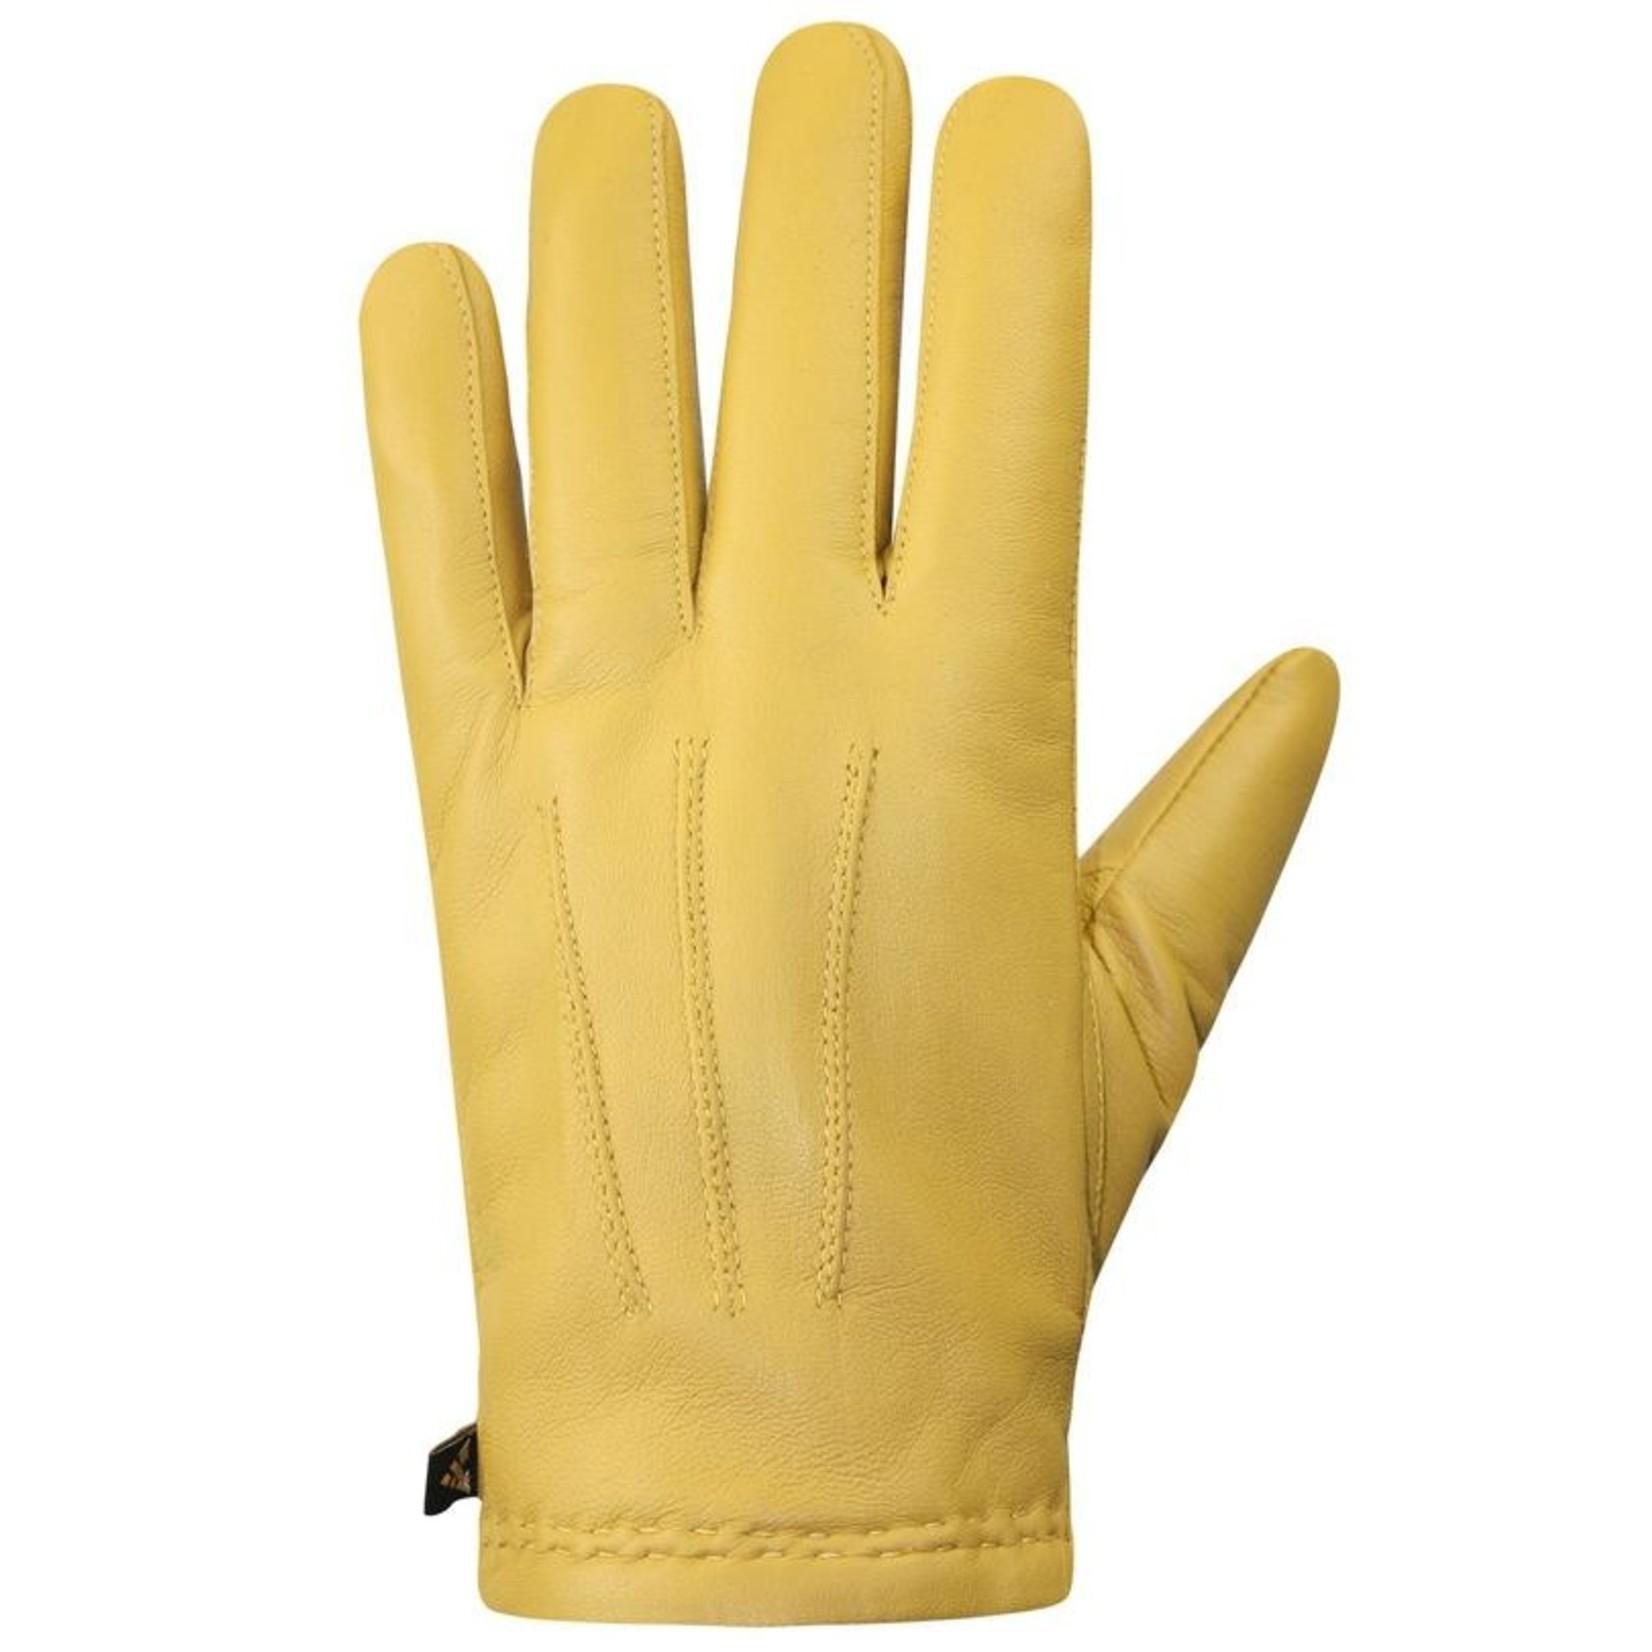 Auclair Auclair 6F066 Wayne Paris Glove